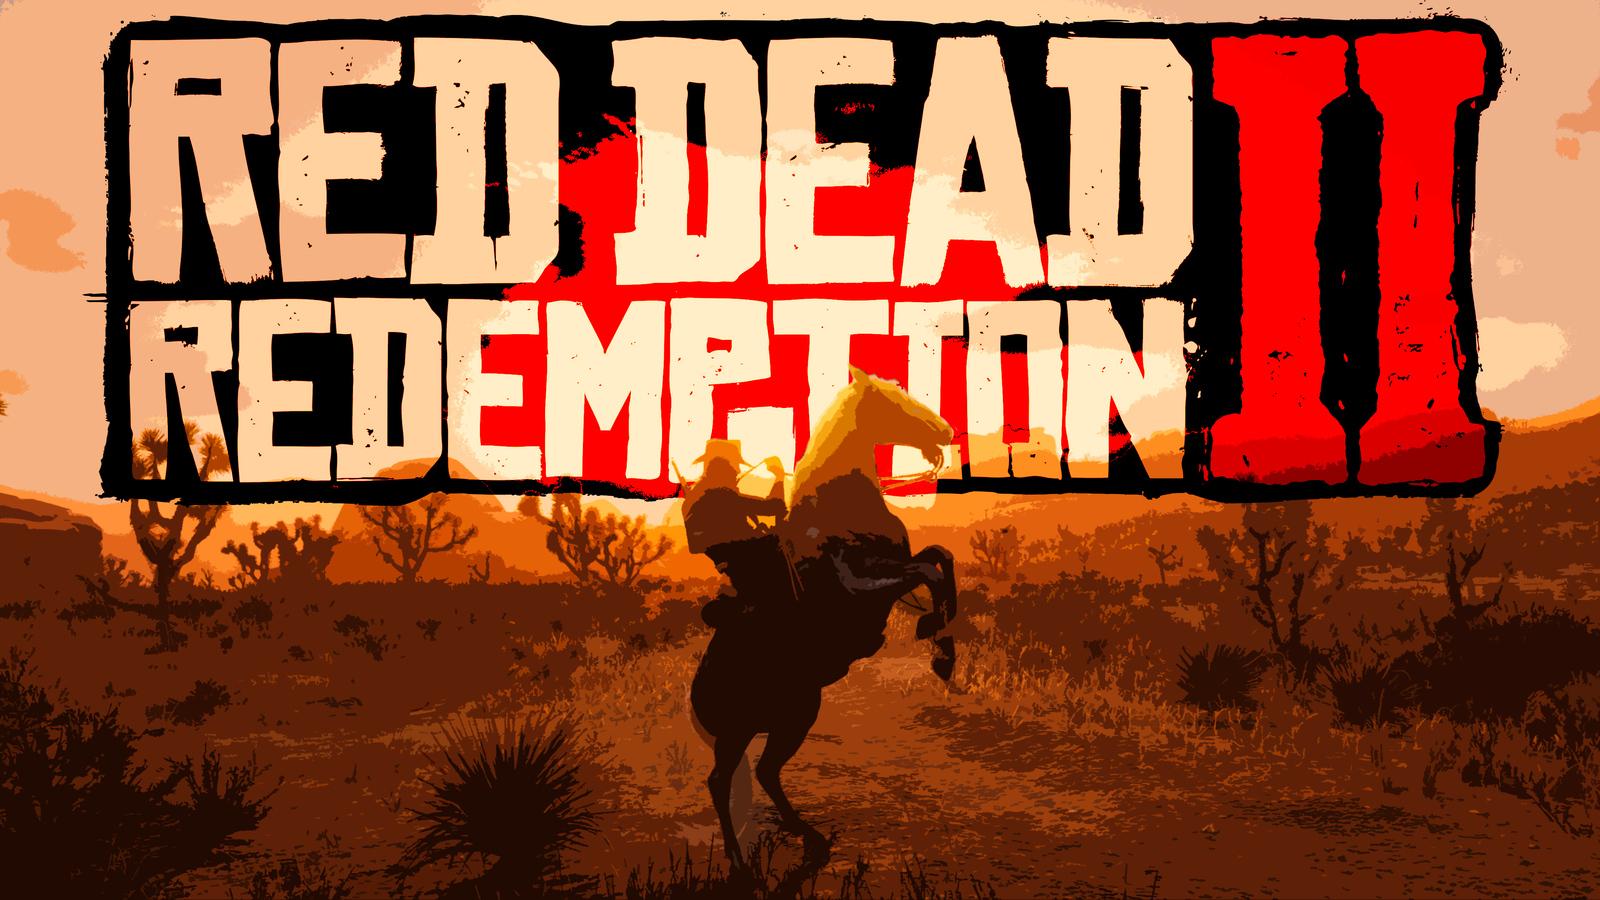 1600x900 Red Dead Redemption 2 4k 2019 Game 1600x900 Resolution Hd